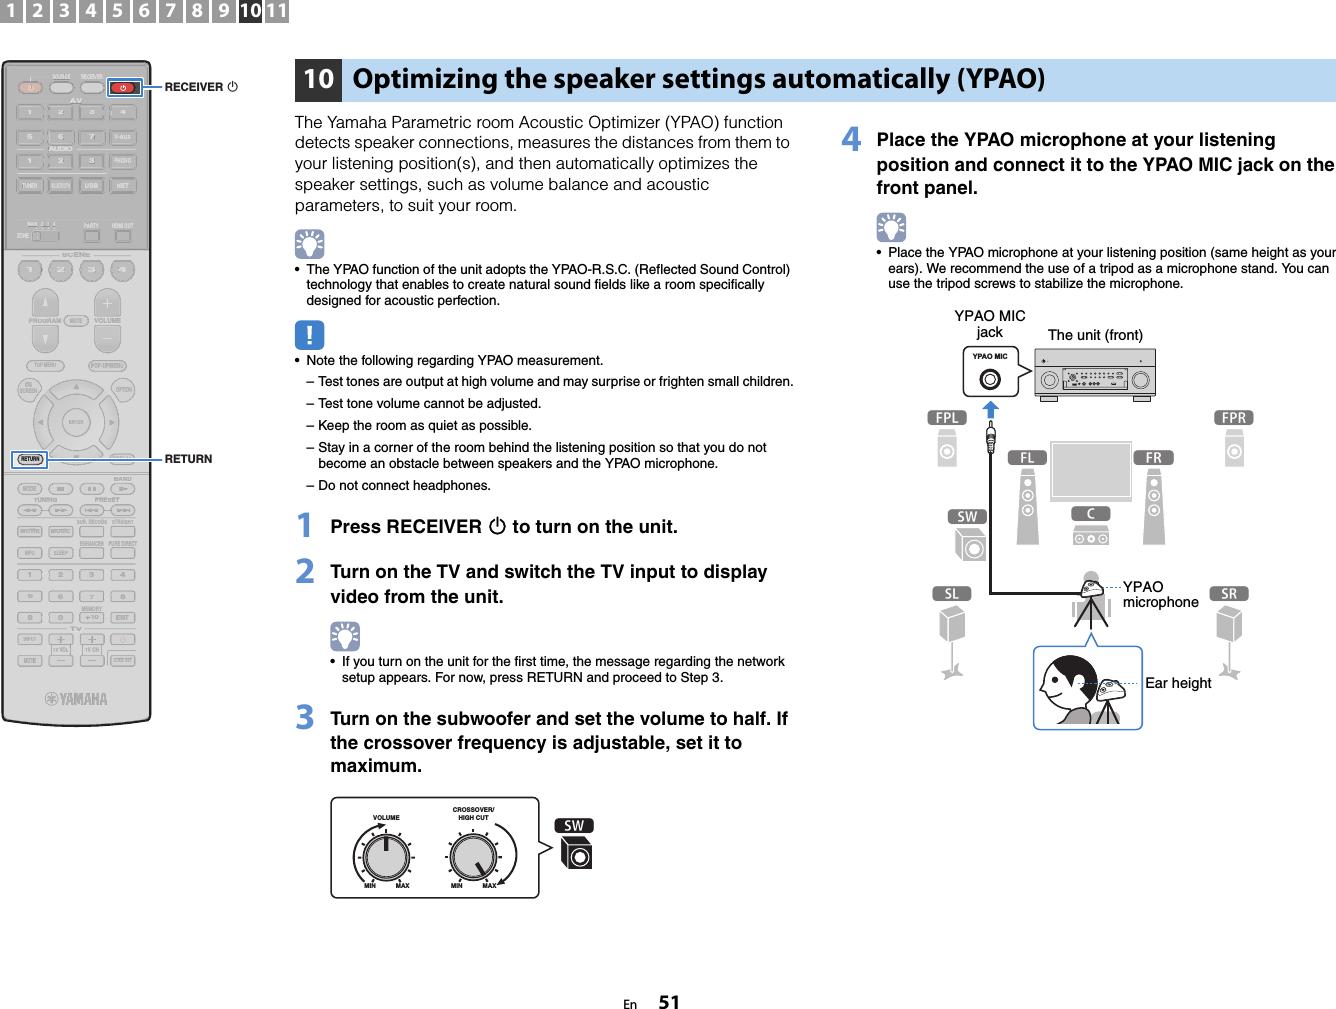 Yamaha RX A3050/RX A2050 Owner's Manual Web YH116A0 EN A3050